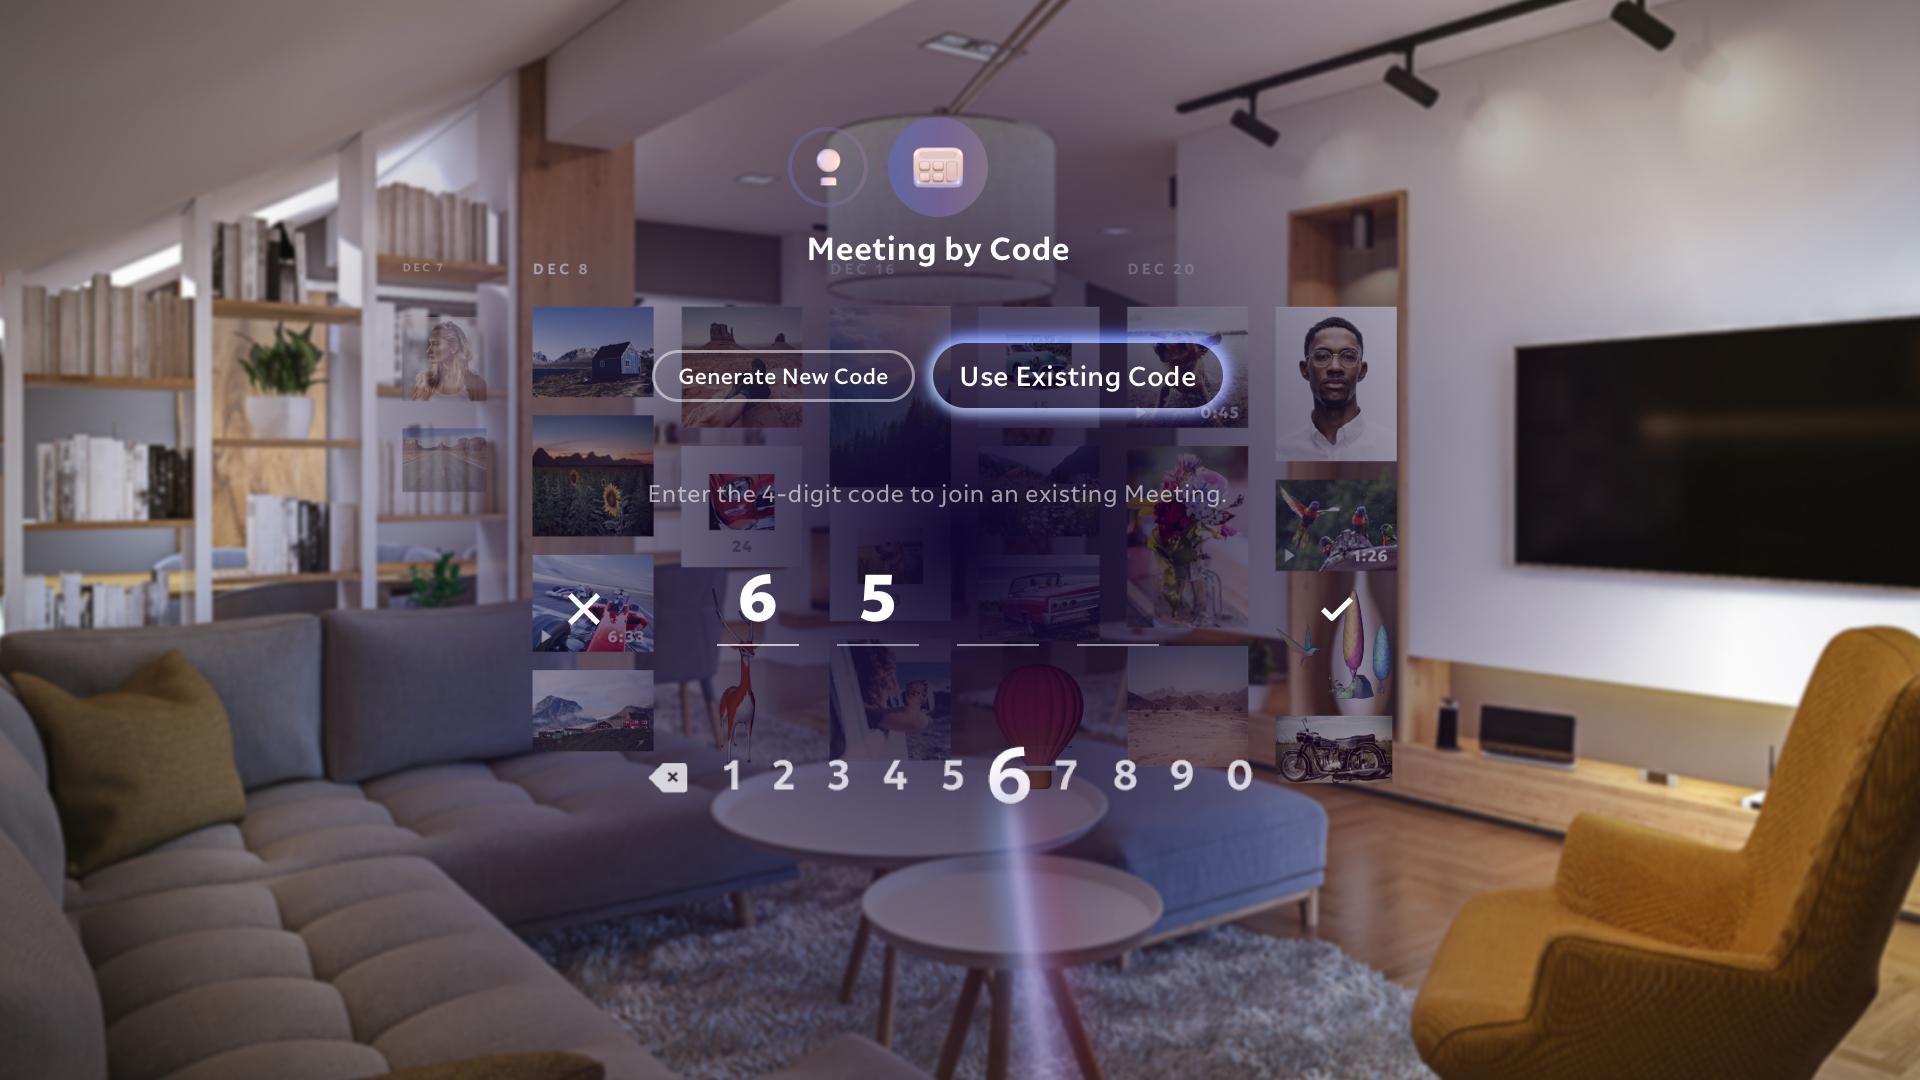 Meetings - Use Existing Code